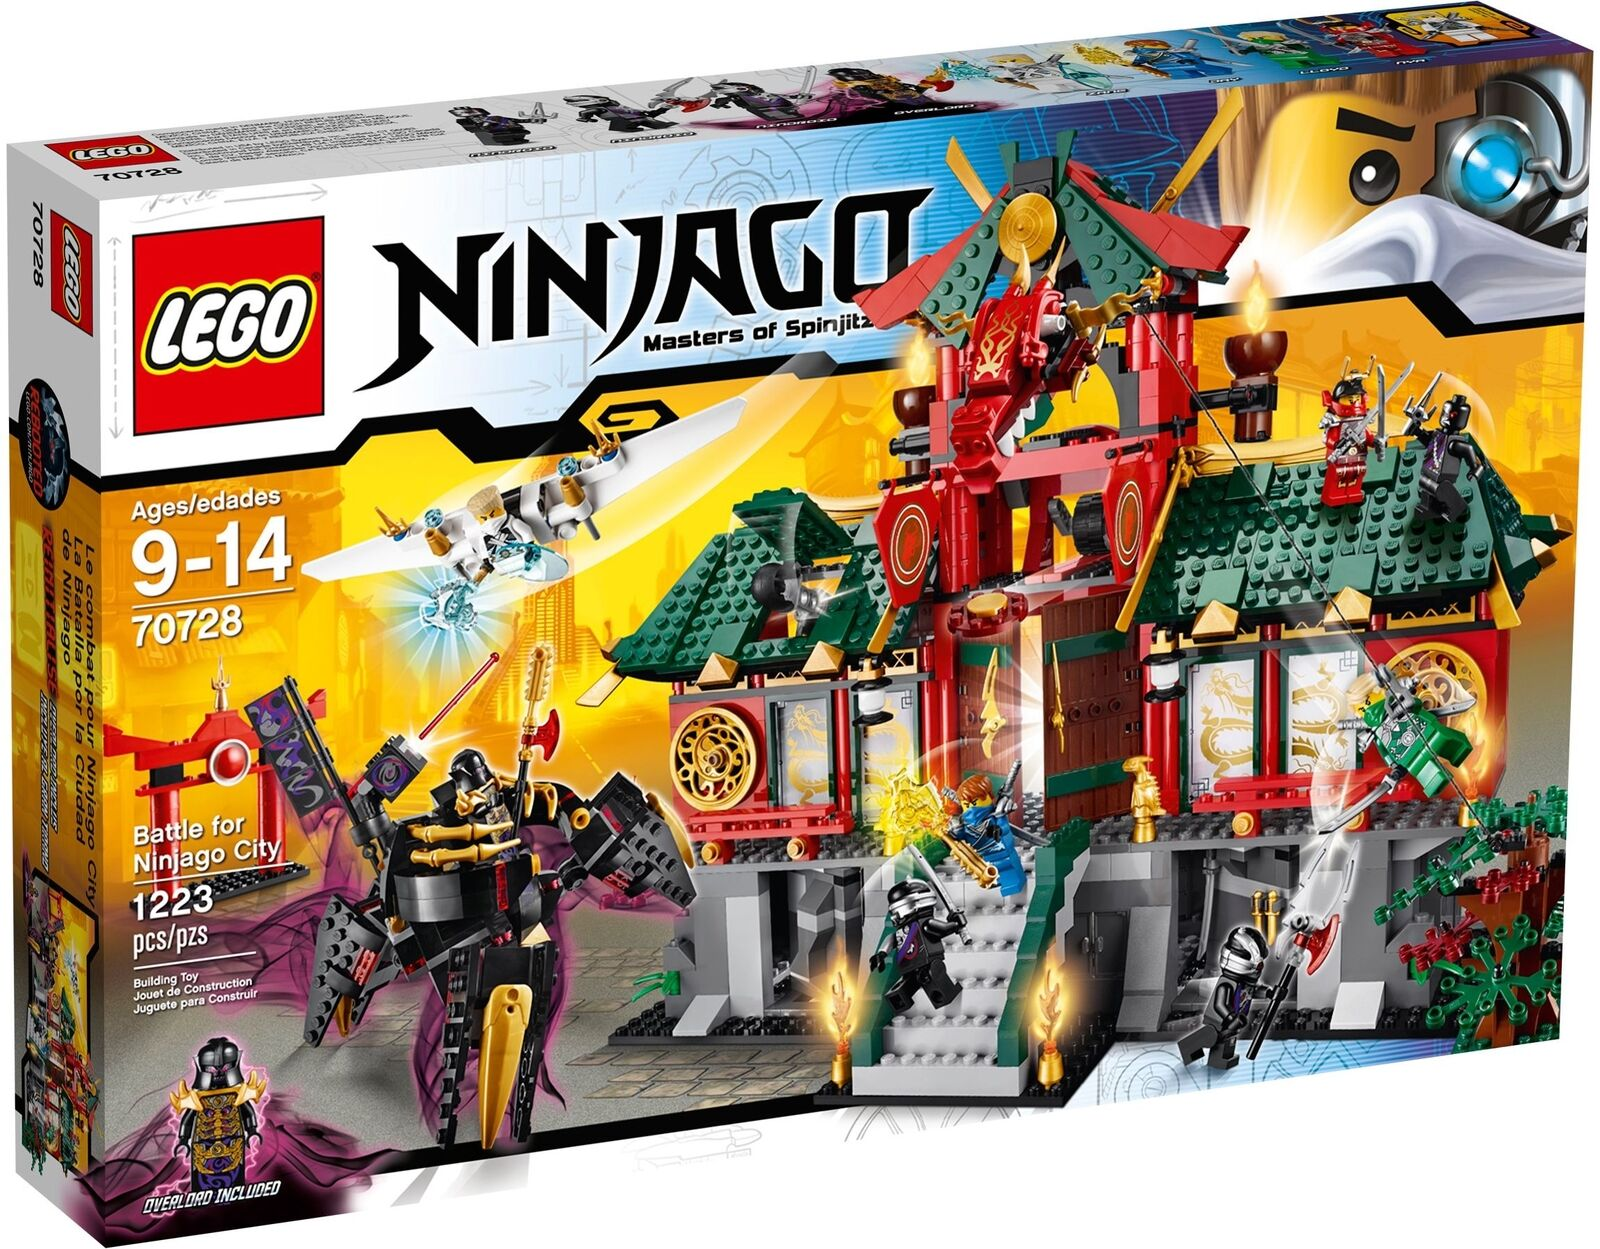 LEGO ® Ninjago 70728 NINJAGO CITY NUOVO OVP _ Battle for NINJAGO CITY NEW MISB NRFB